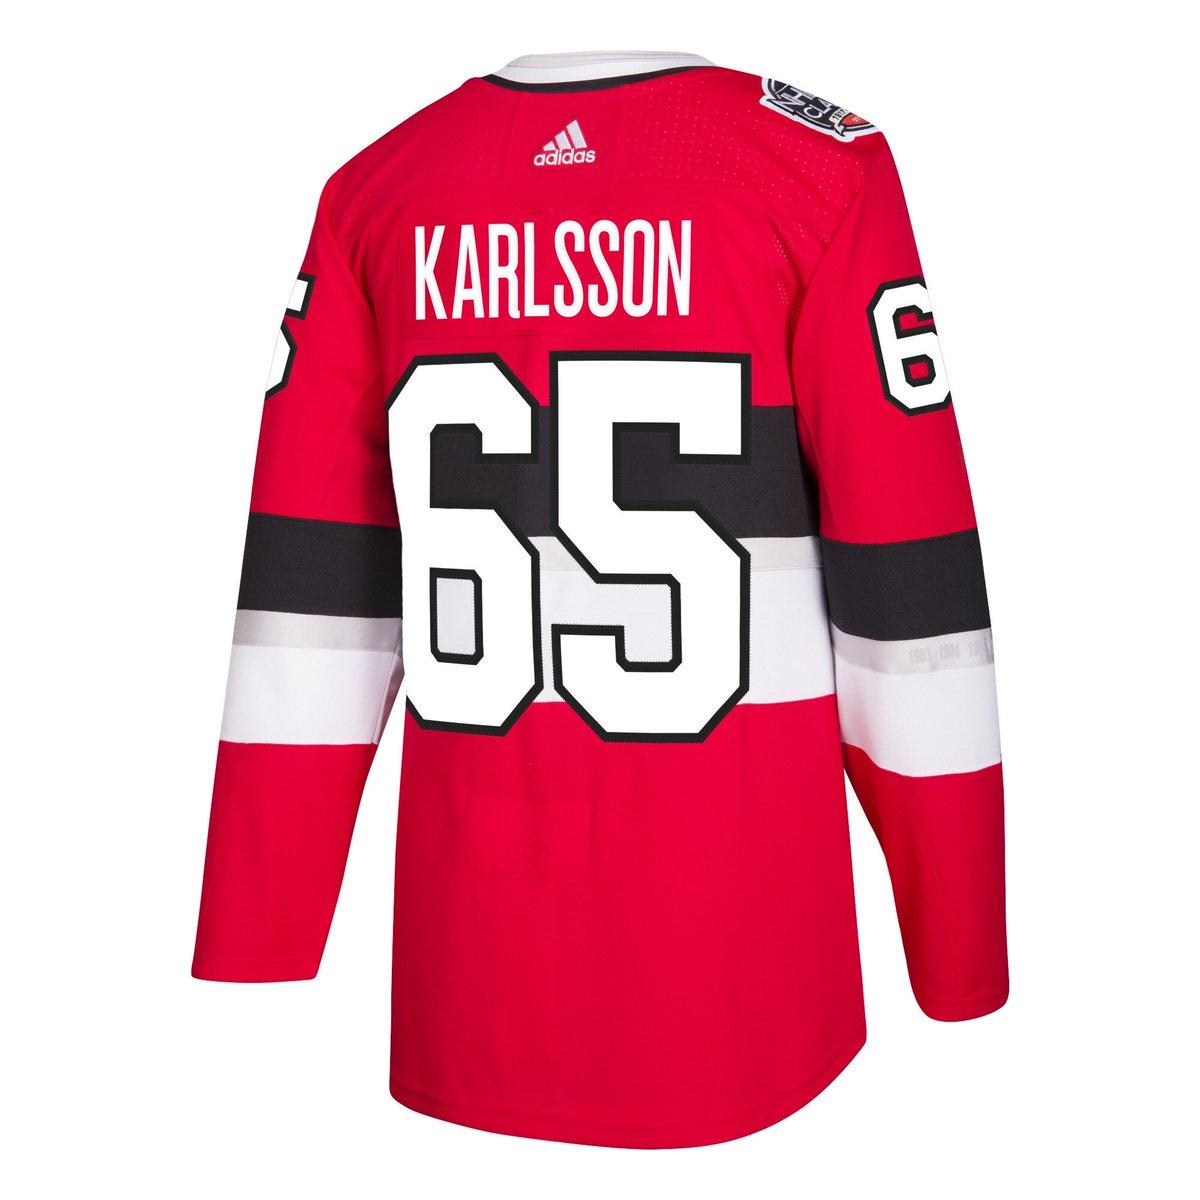 Ottawa Senators on Twitter